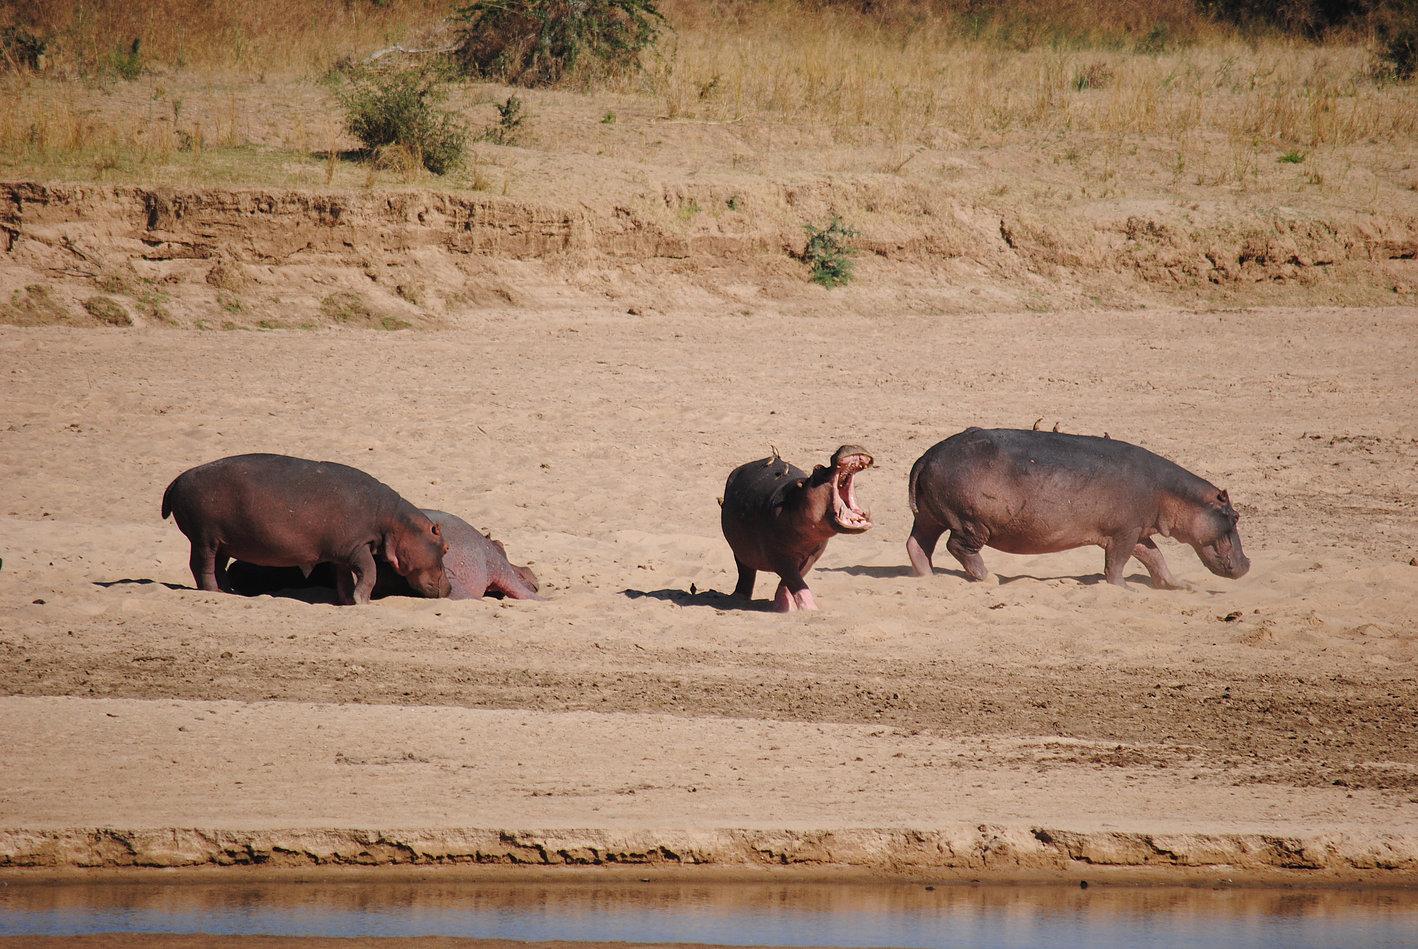 bucket-list African adventures, walking safari